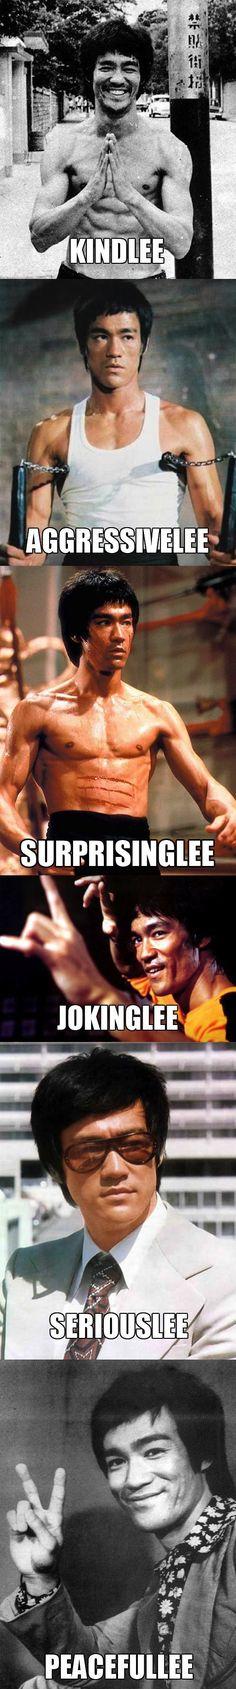 The many sides of Bruce Lee ------------------------------------ www.urbanwarriorsacademy.com www.facebook.com/urbanwarriorslondon www.twitter.com/UWAlondon  Come on... He's one of the best :)